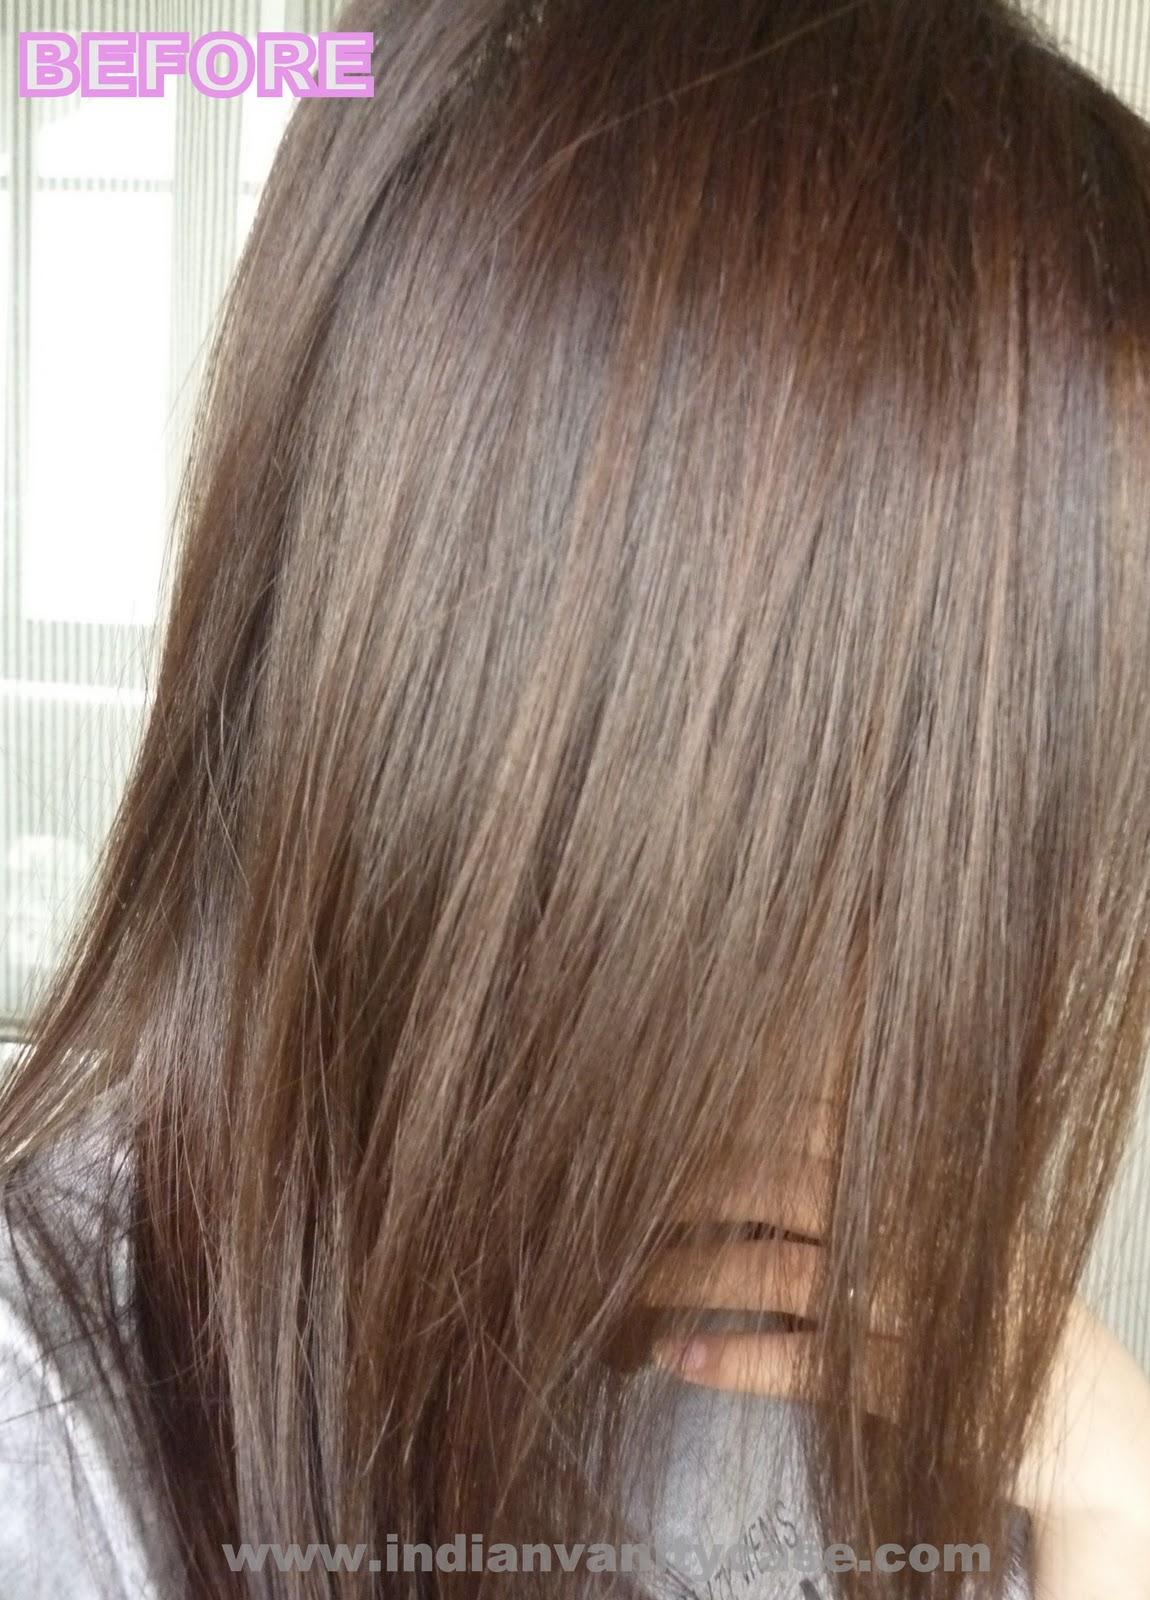 ... using Wella Kolestint 6/0 Light Brown , my hair turned a level 2-3